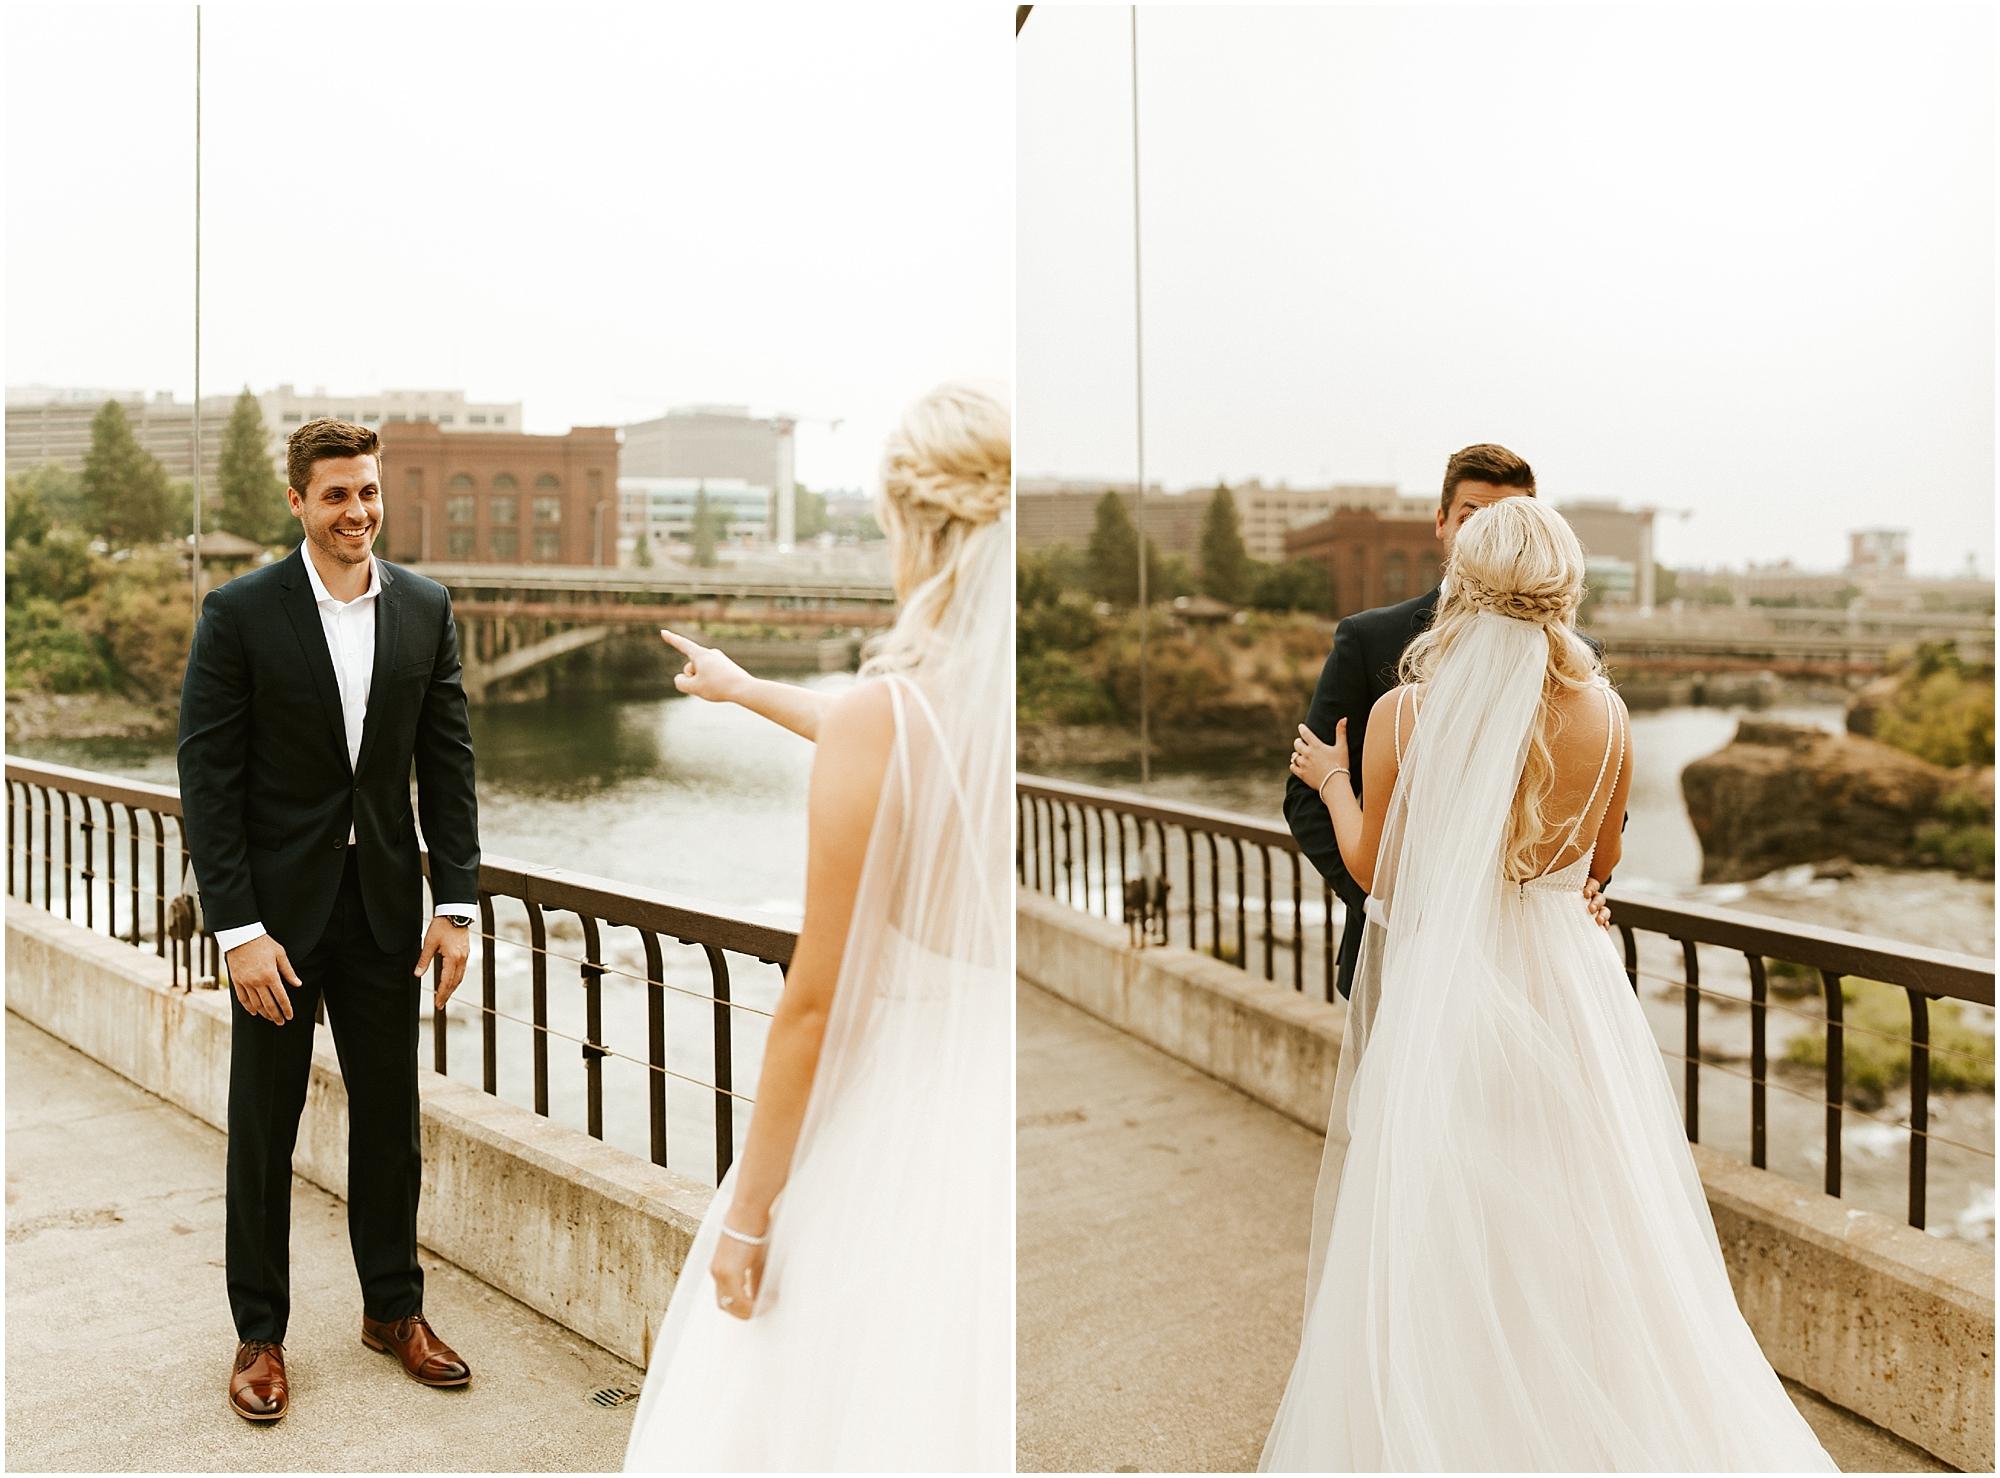 Chateau Rive Spokane Wedding Cassie Trottier Photography1024.jpg